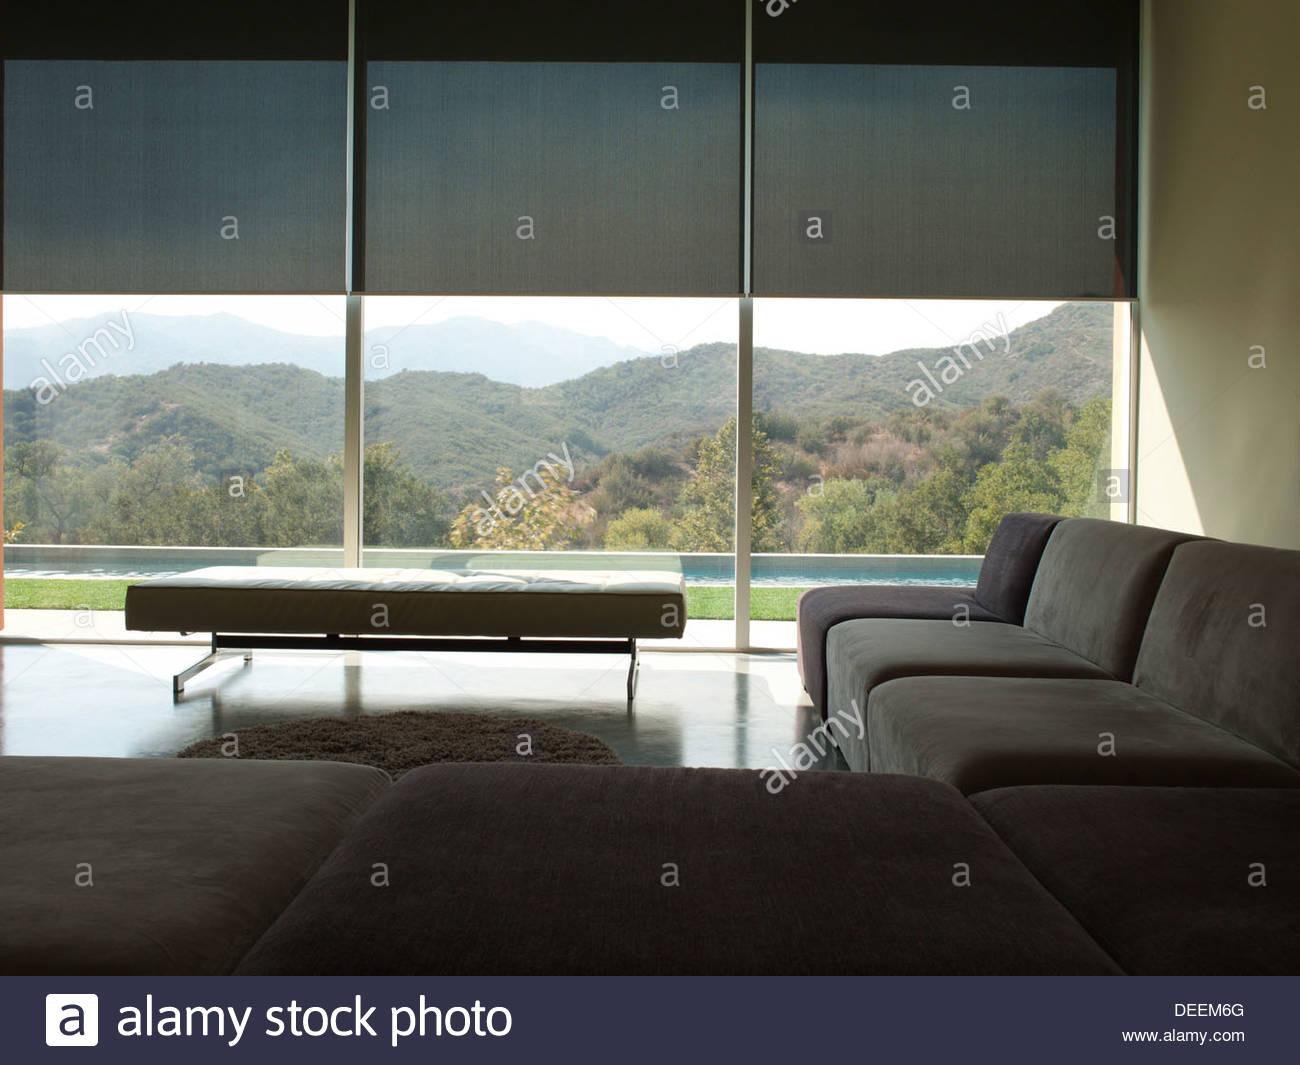 Interior of modern living room - Stock Image